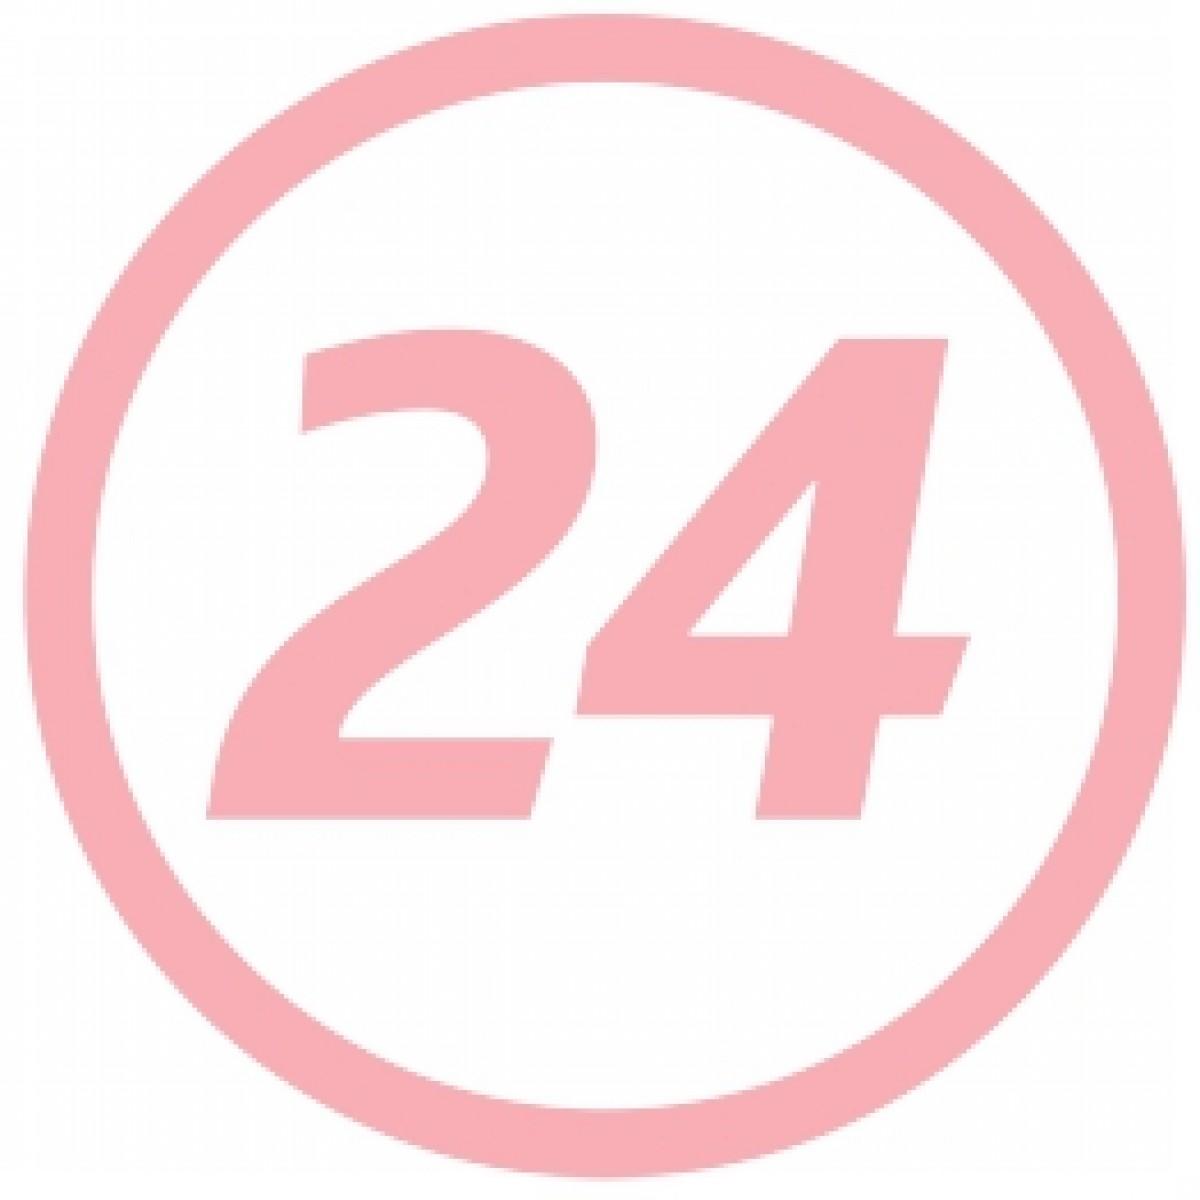 Ducray A-Derma Protect Spray SPF 50+, Spray, 200ml